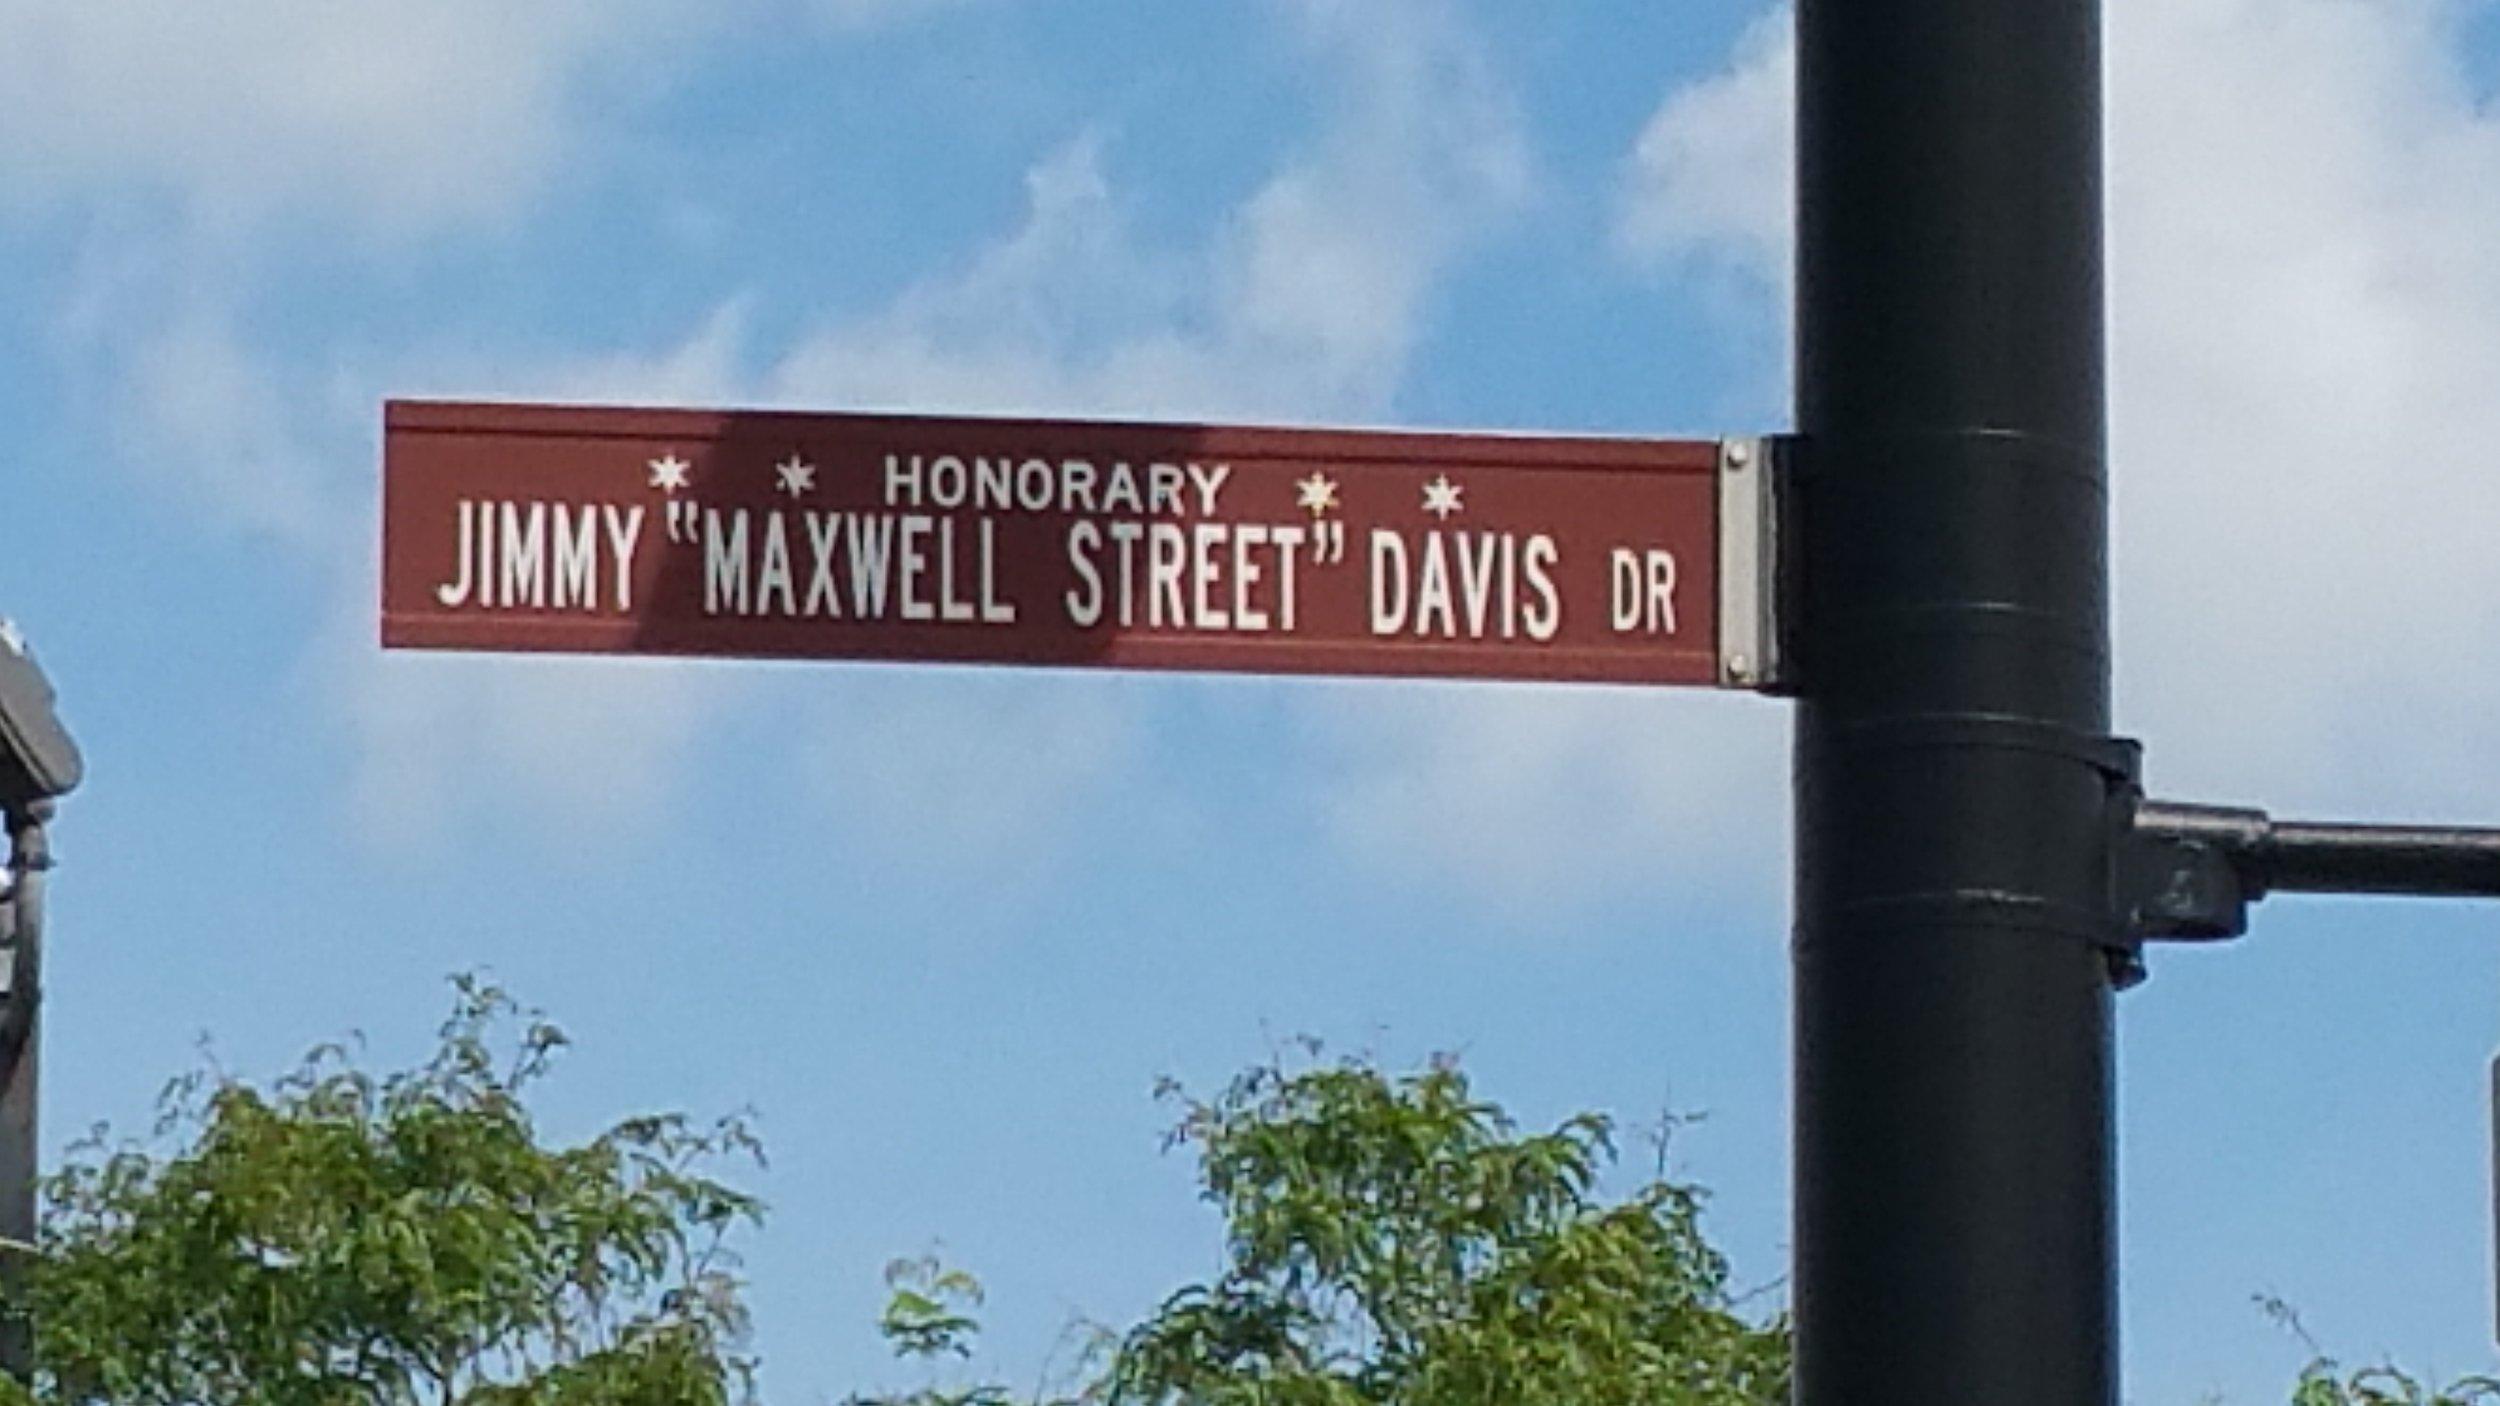 Honorary Jimmy Maxwell Street Davis Drive - Chicago.jpg